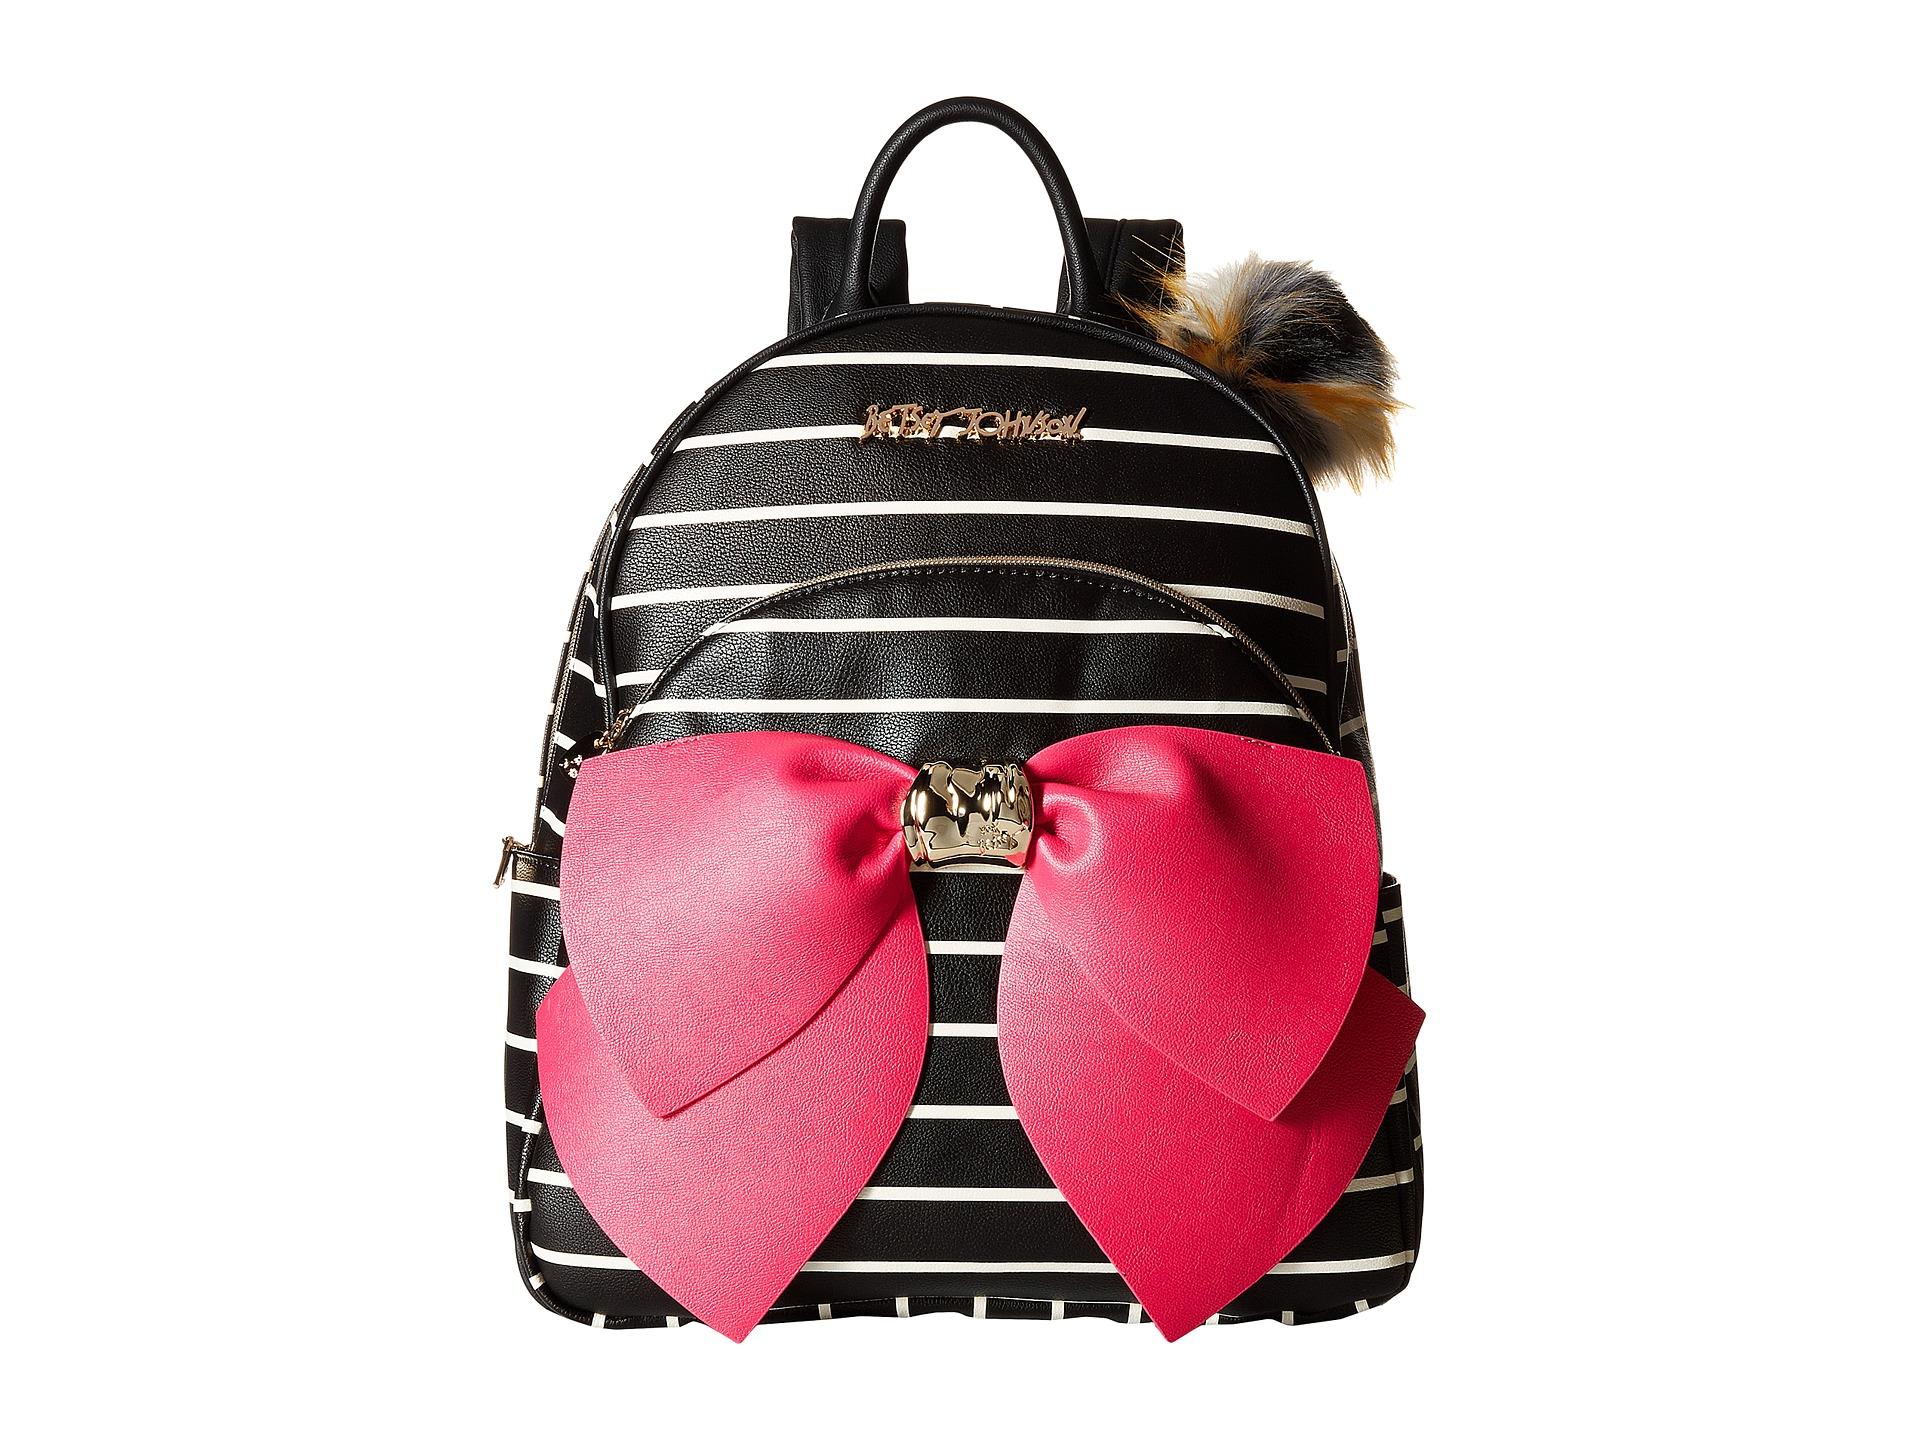 Betsey Johnson Bow Backpack BlackStripe Zapposcom Free Shipping